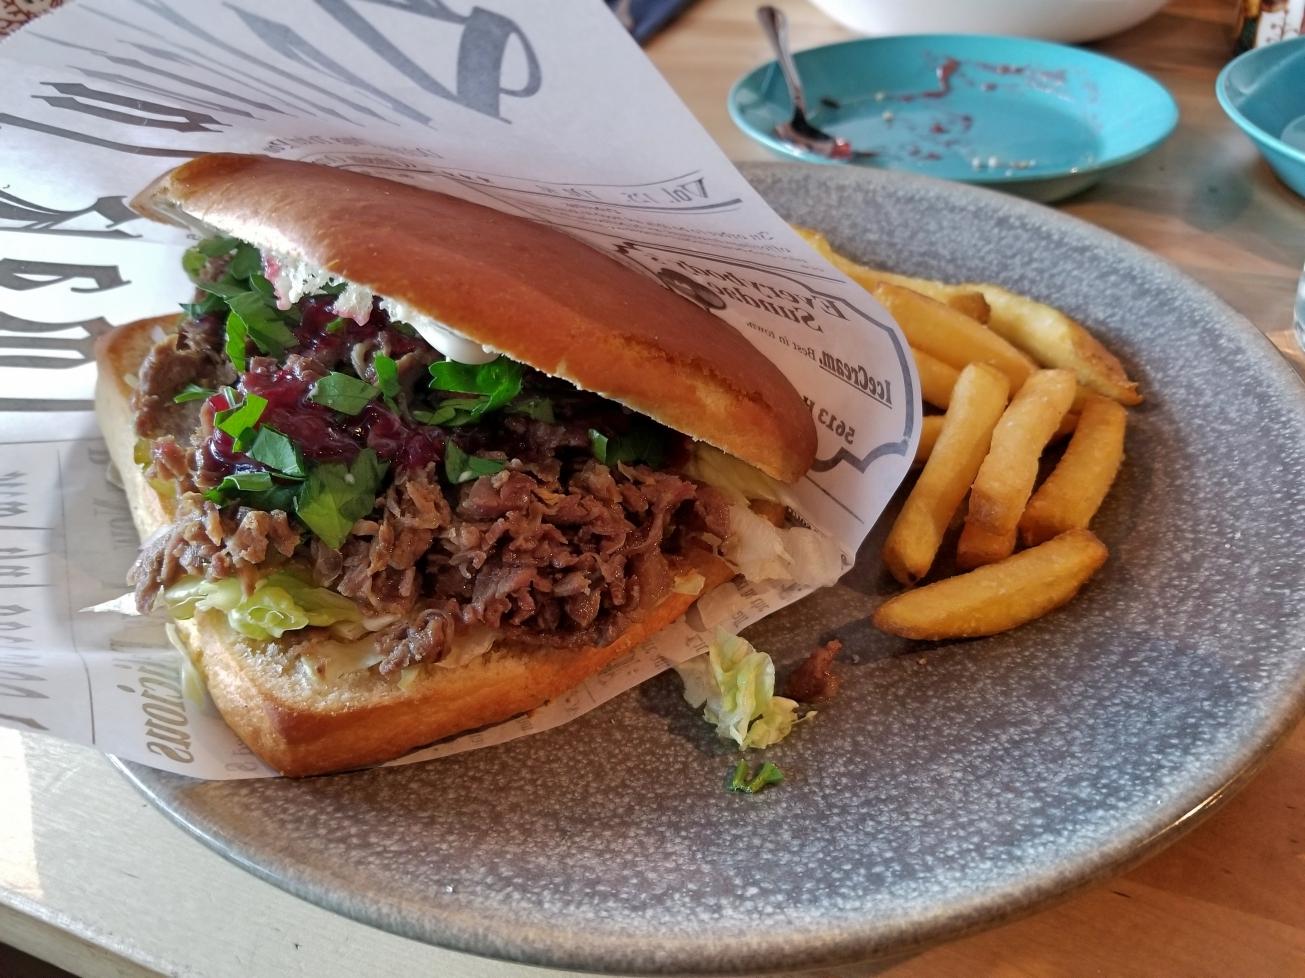 Roka_reindeer_sandwich